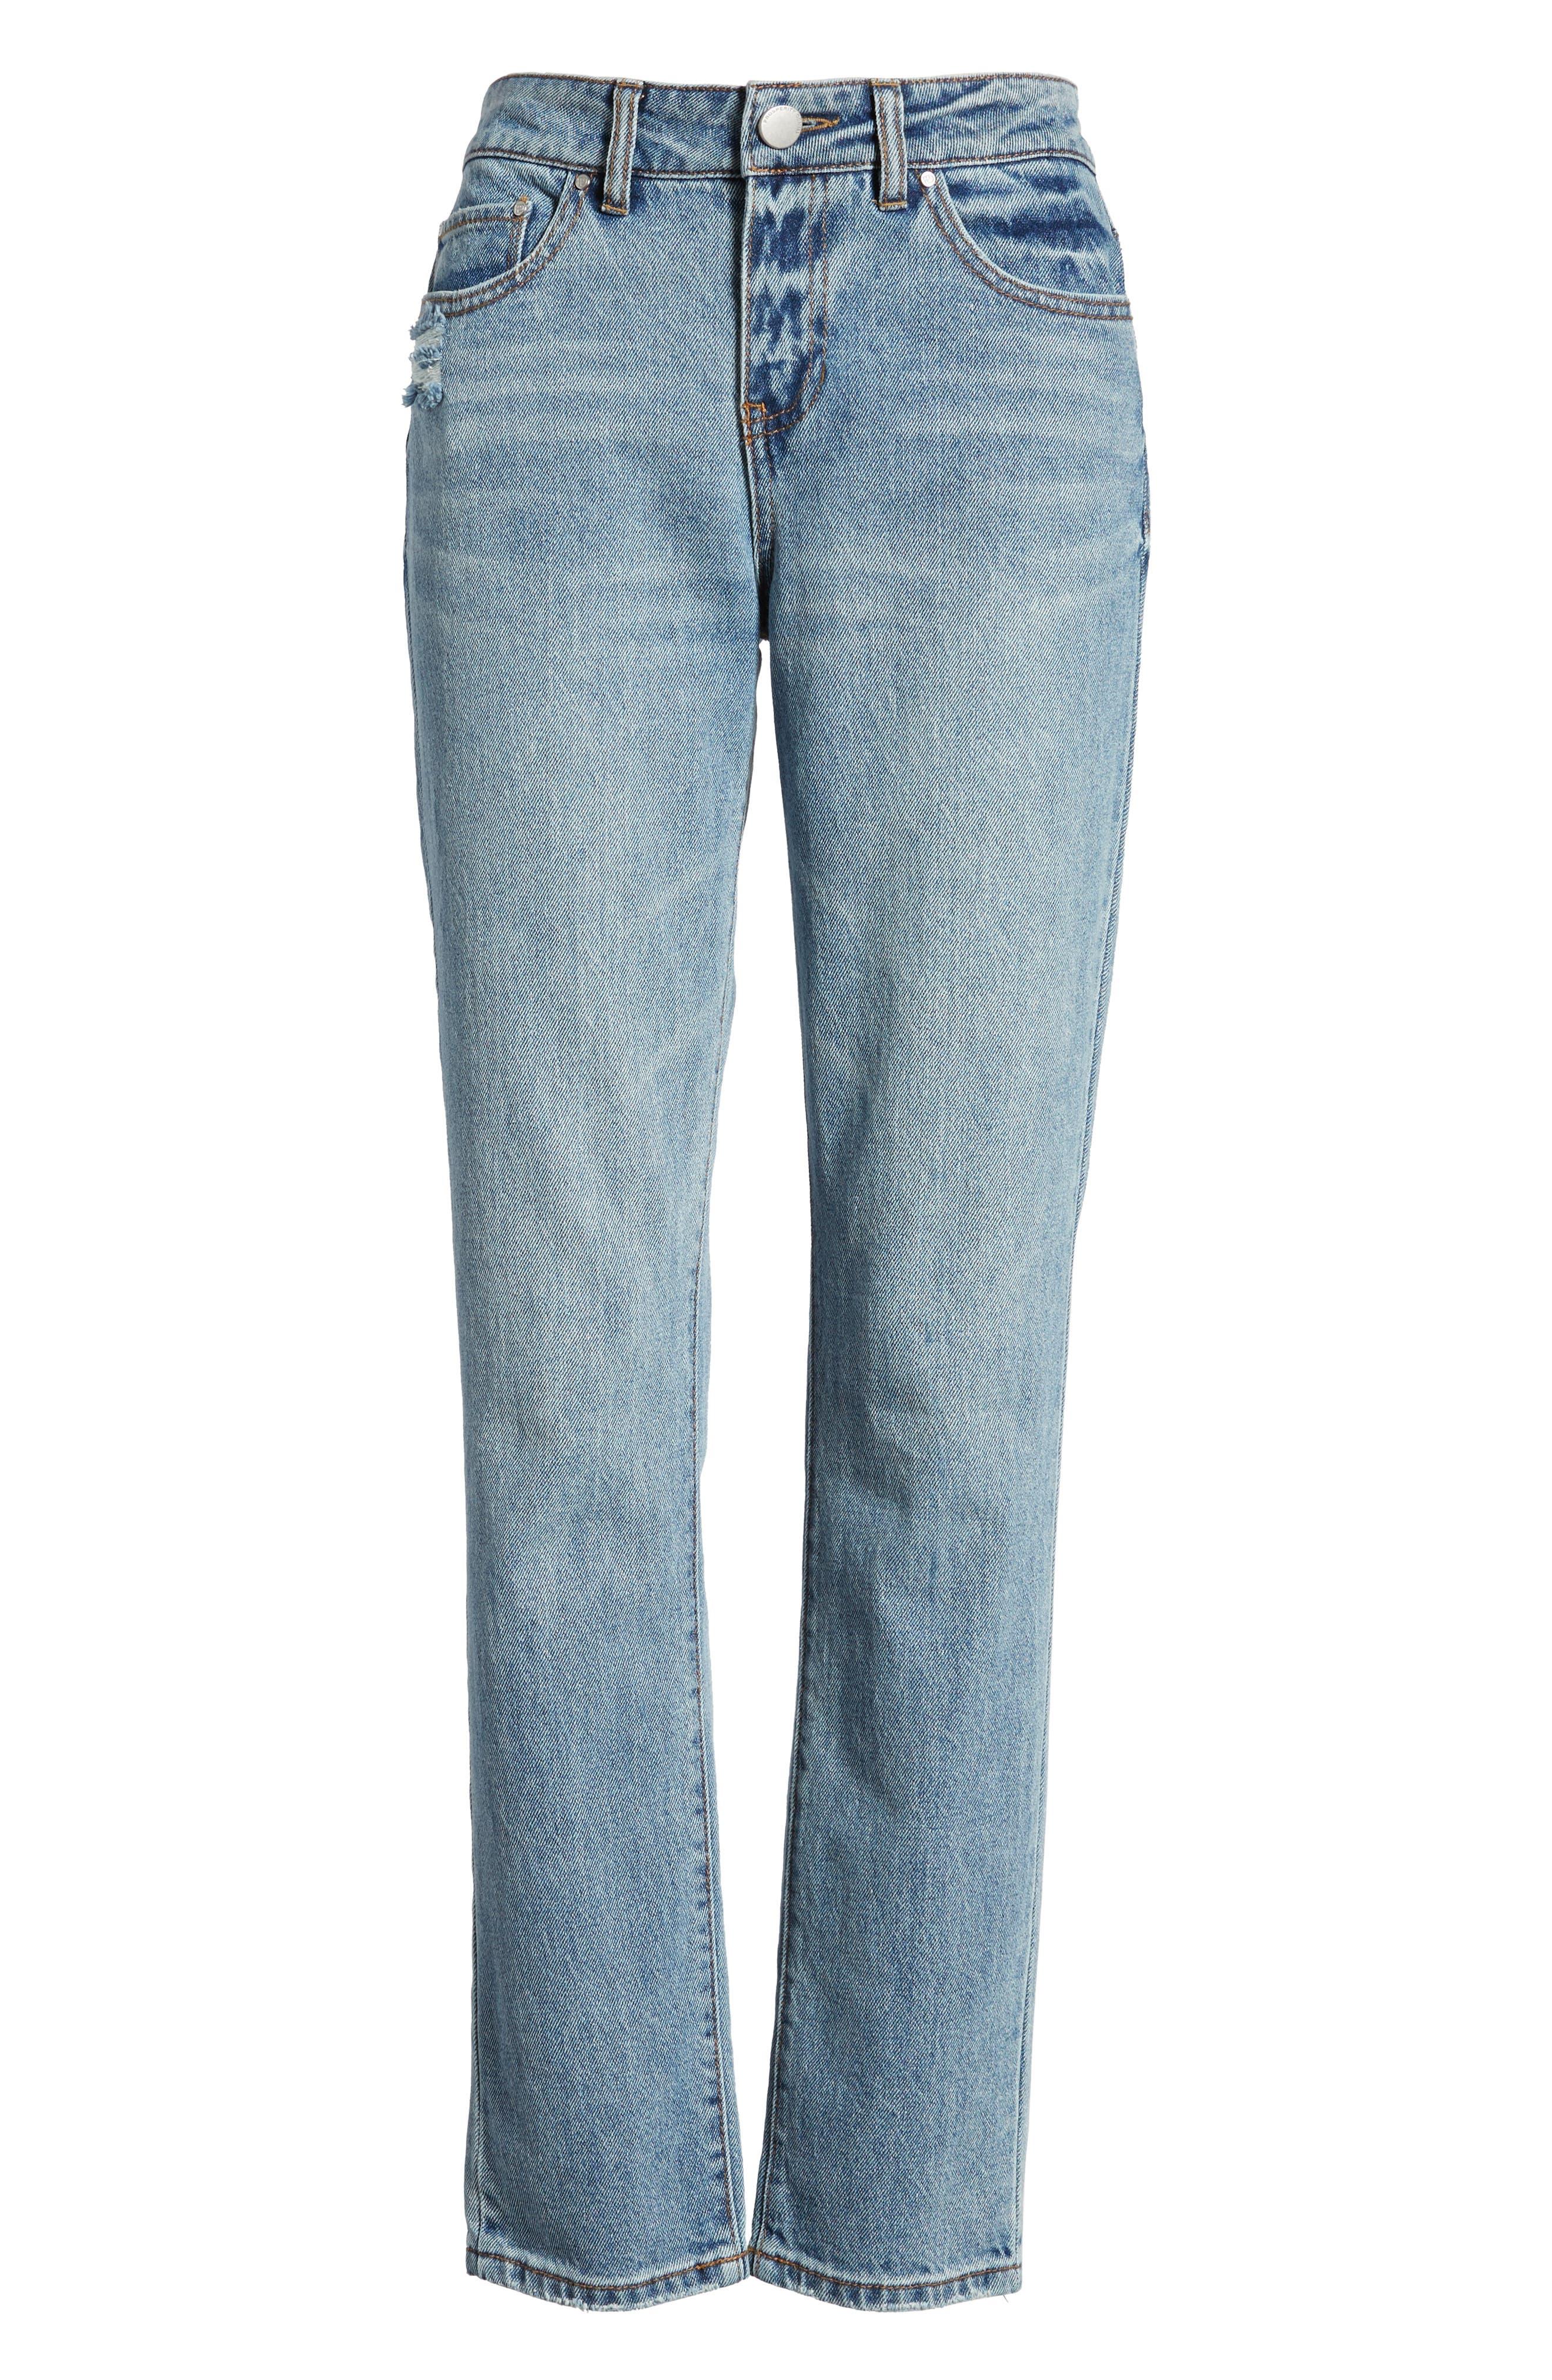 High Waist Skinny Jeans,                             Alternate thumbnail 7, color,                             Medium